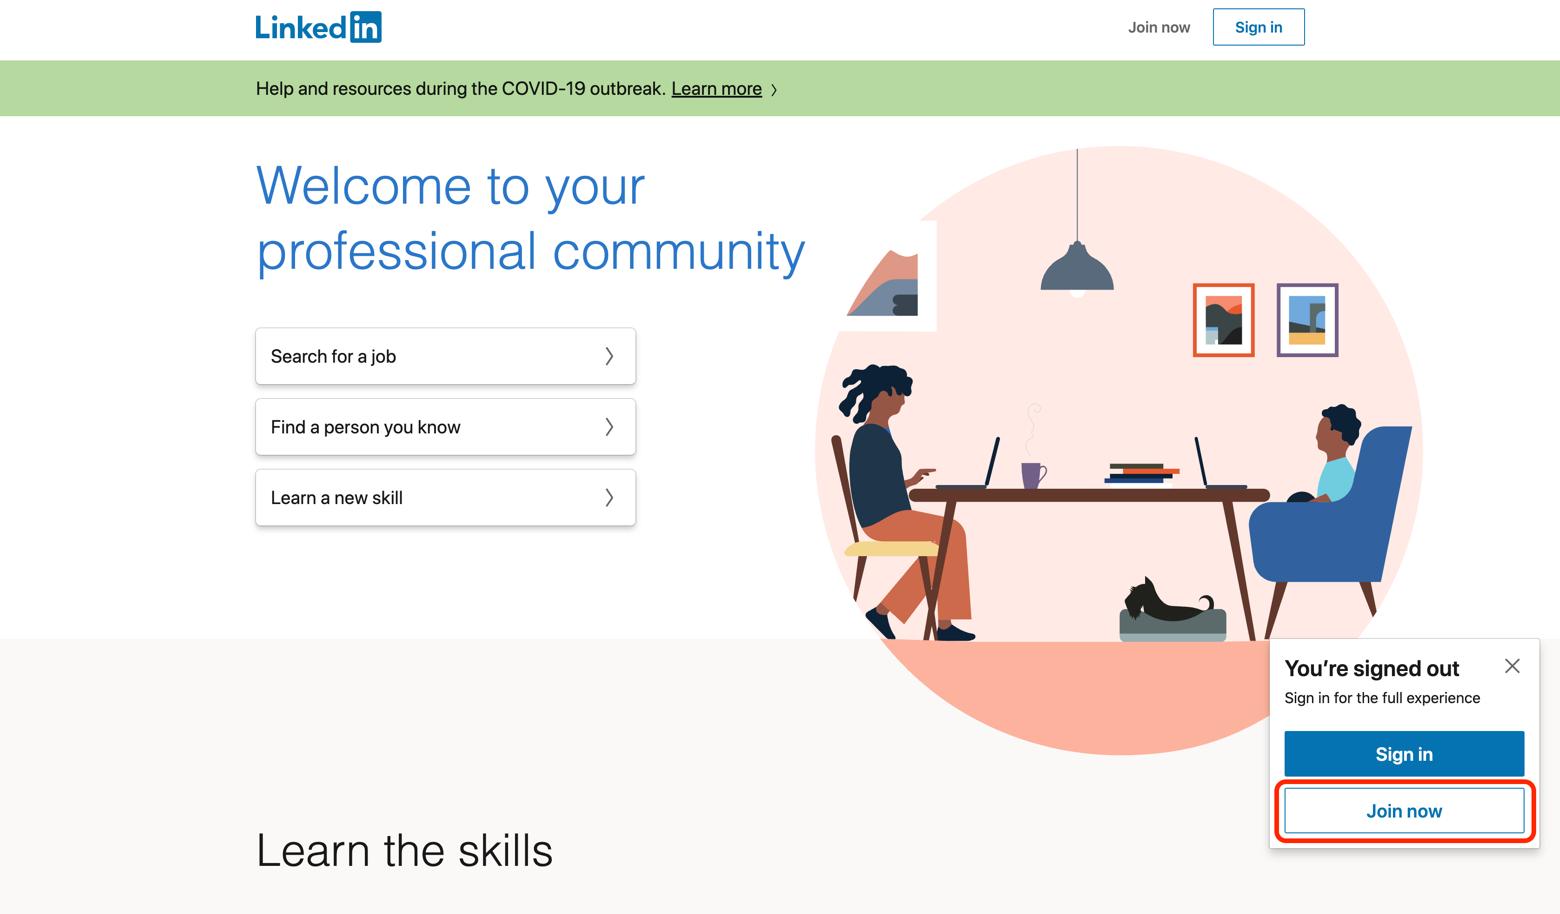 LinkedIn landing page